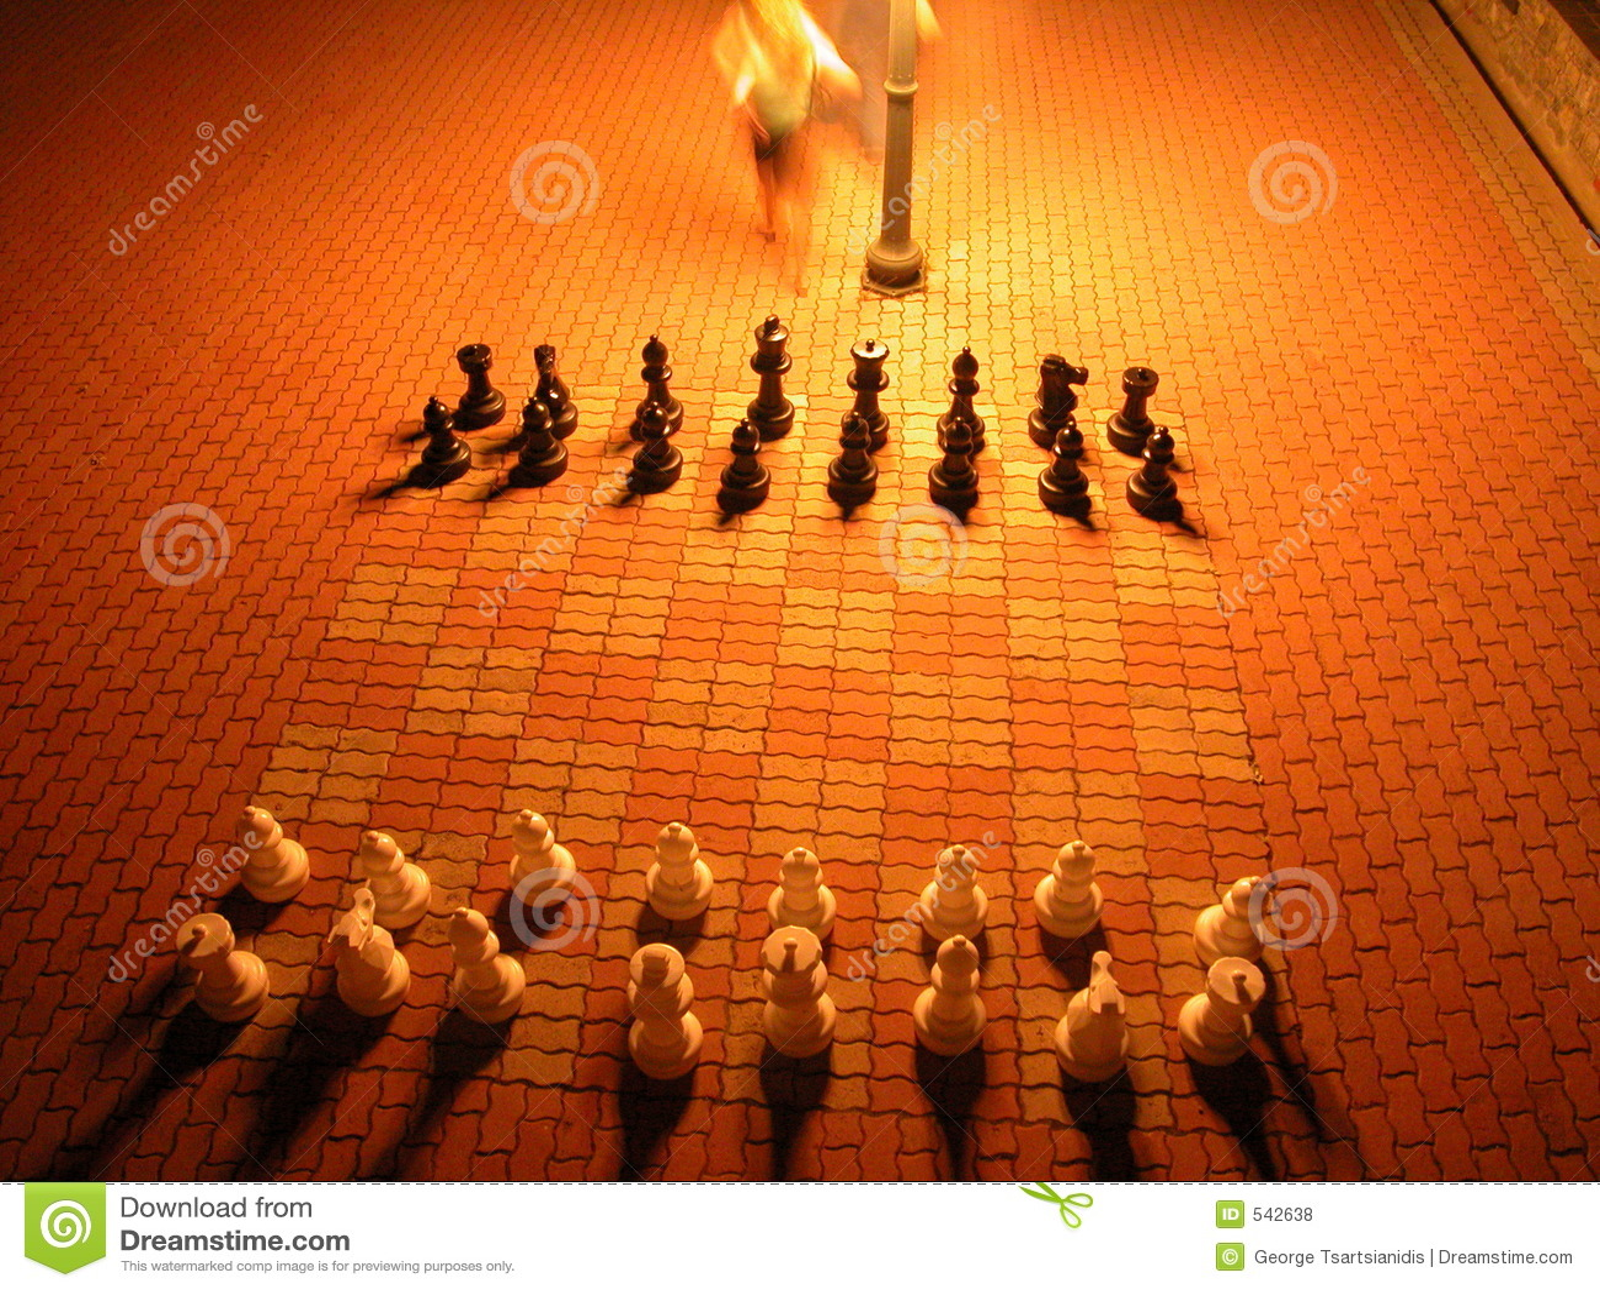 Download 棋 库存照片. 图片 包括有 对象, 玻璃, 执行, 关闭, 会议室, 射击, 自然, 印第安语, 移动, 小组 - 542638